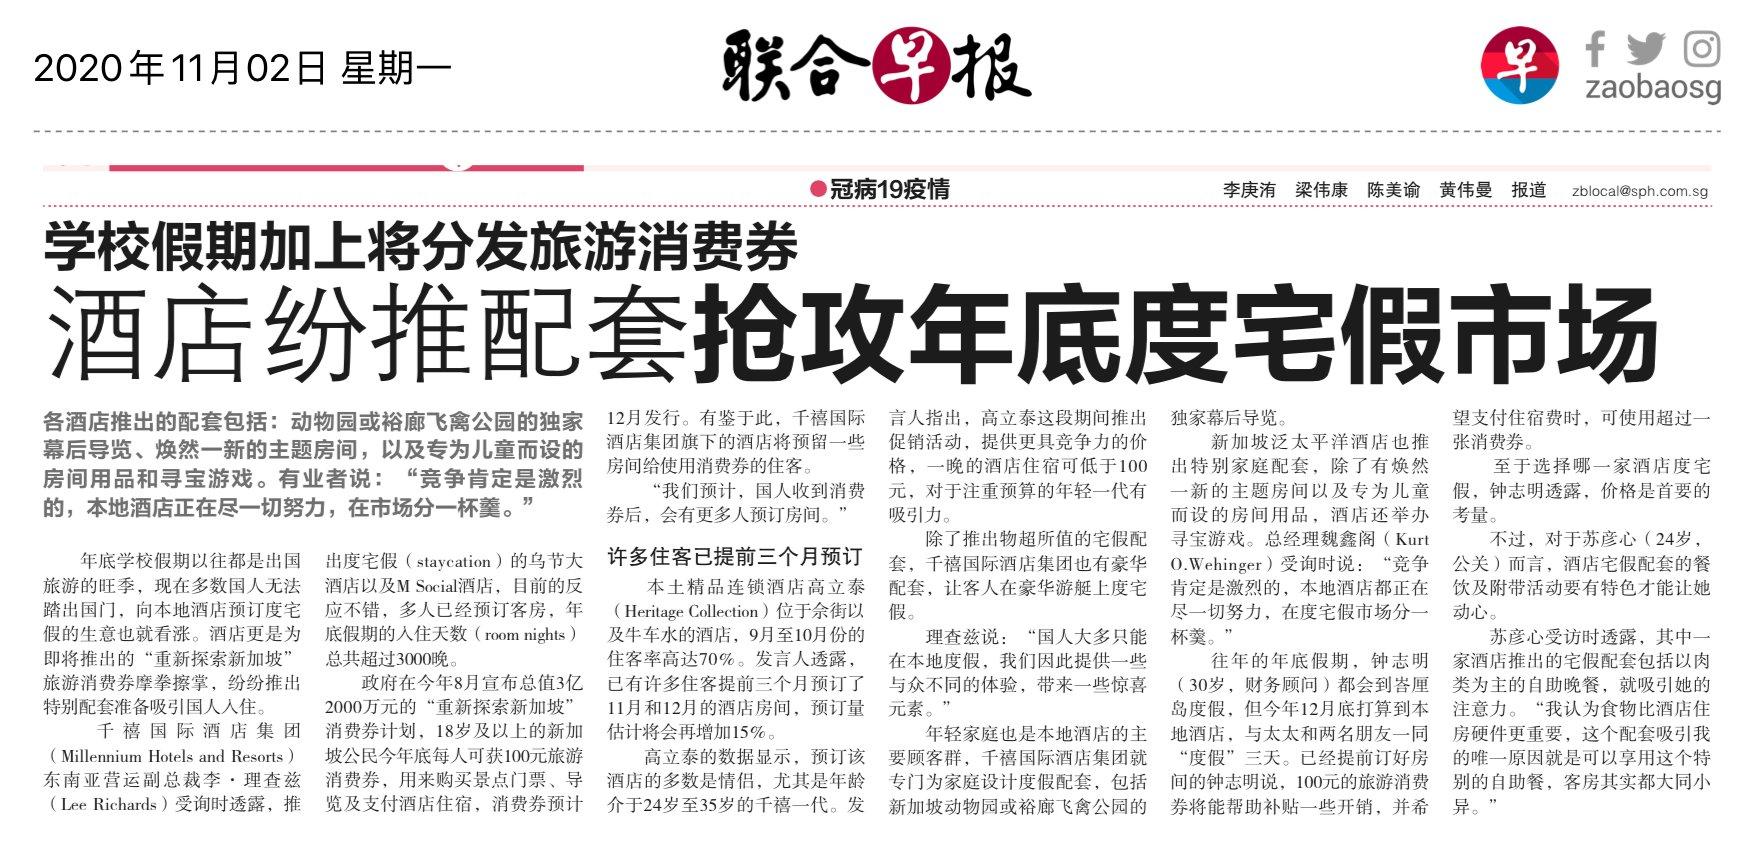 Lianhe Zaobao: 学校假期加上将分发旅游消费券 酒店纷推配套抢攻年底度宅假市场